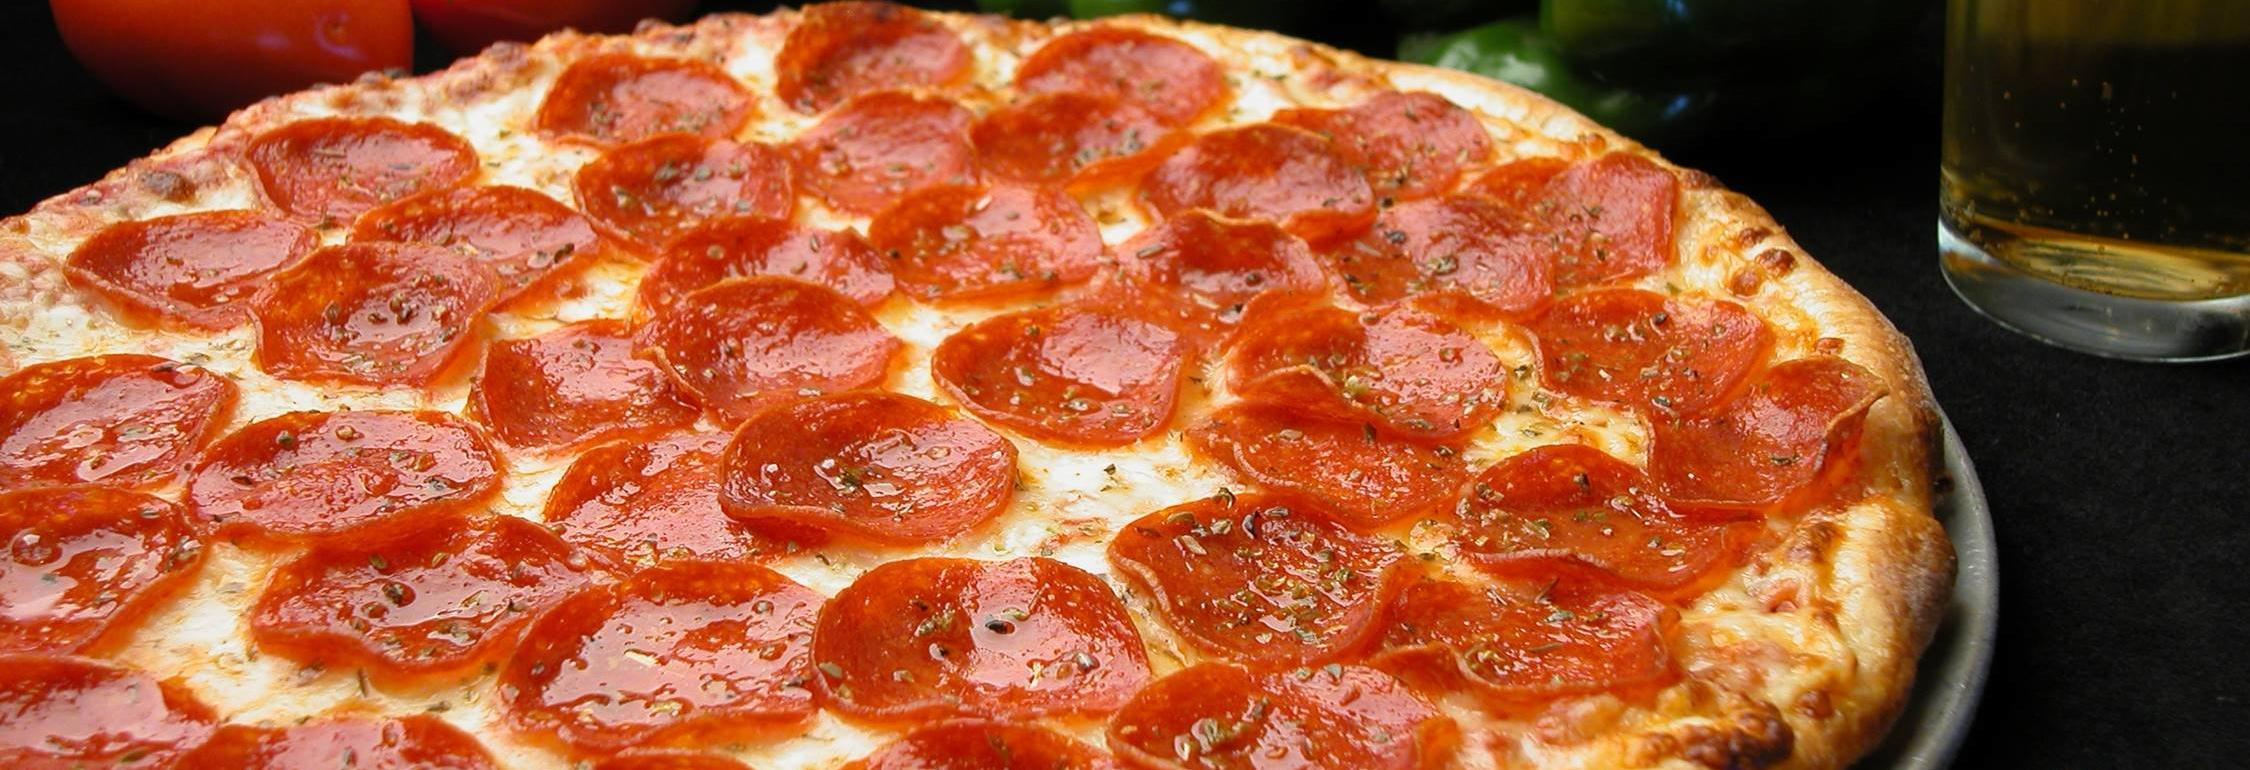 Marino's Pizza in Runnemede, NJ banner